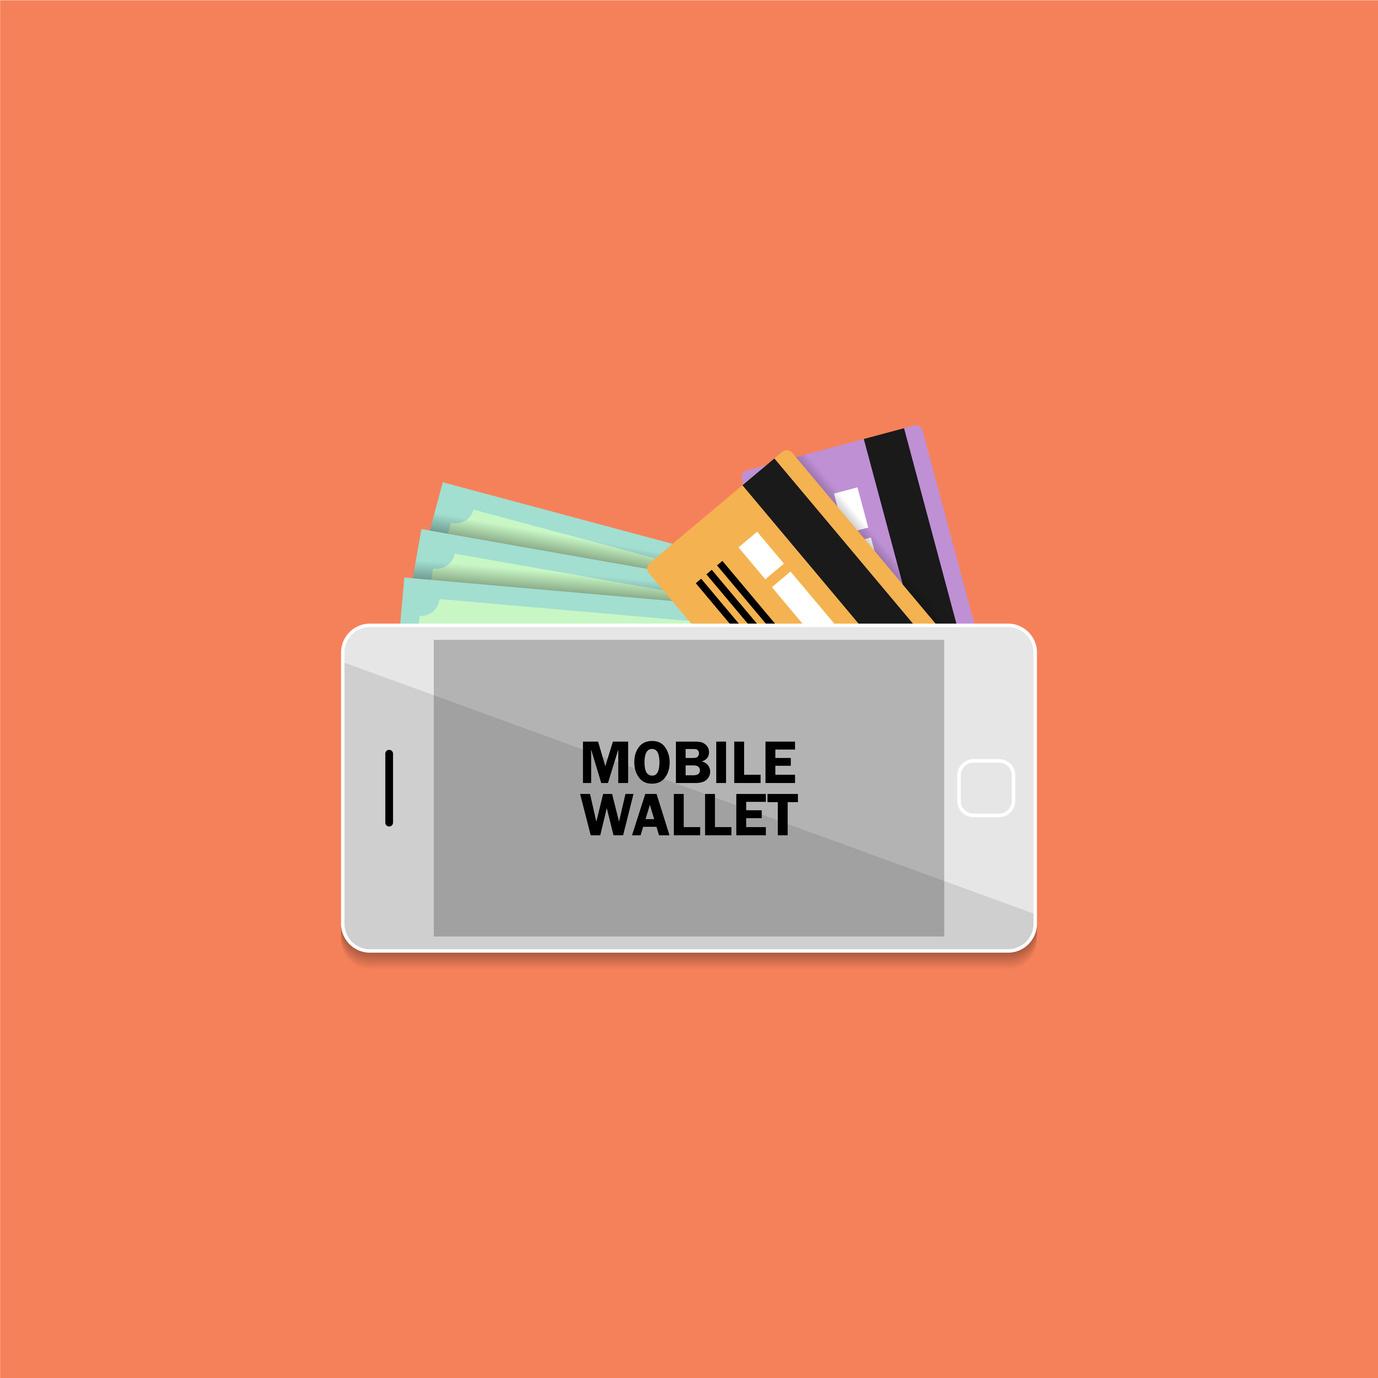 Digital mobile wallet